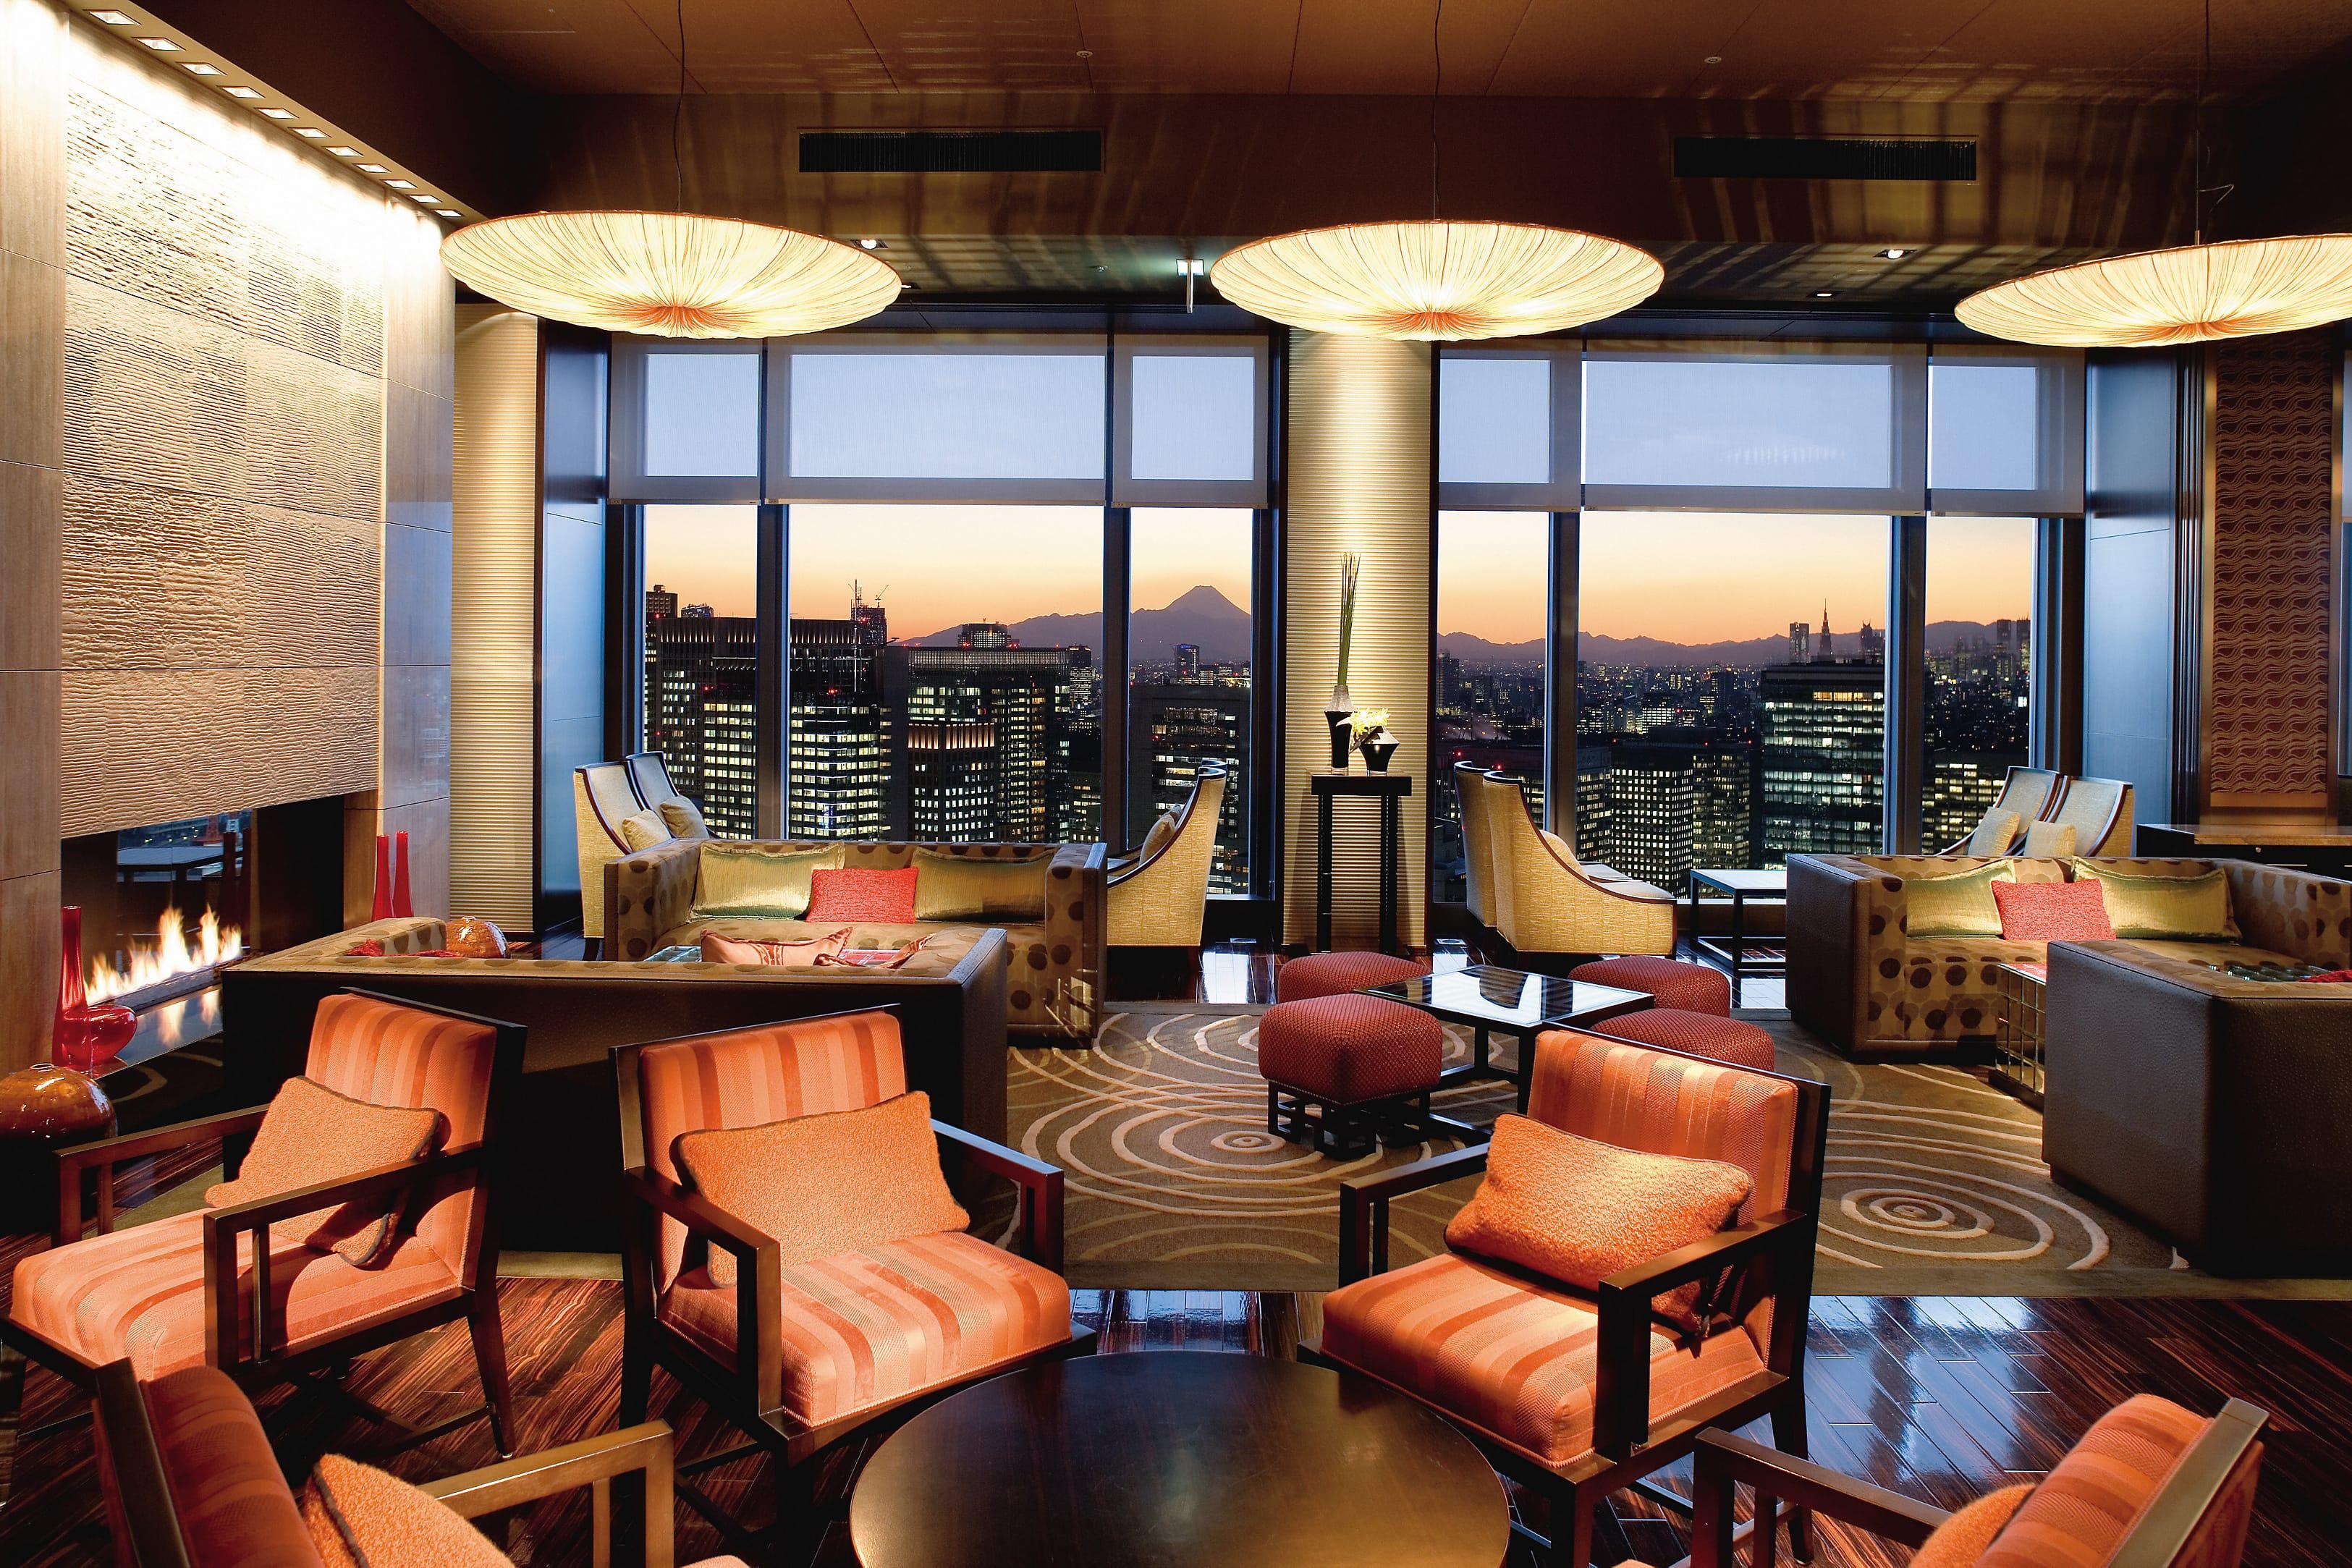 galer a fotogr fica del hotel de tokio hotel mandarin. Black Bedroom Furniture Sets. Home Design Ideas